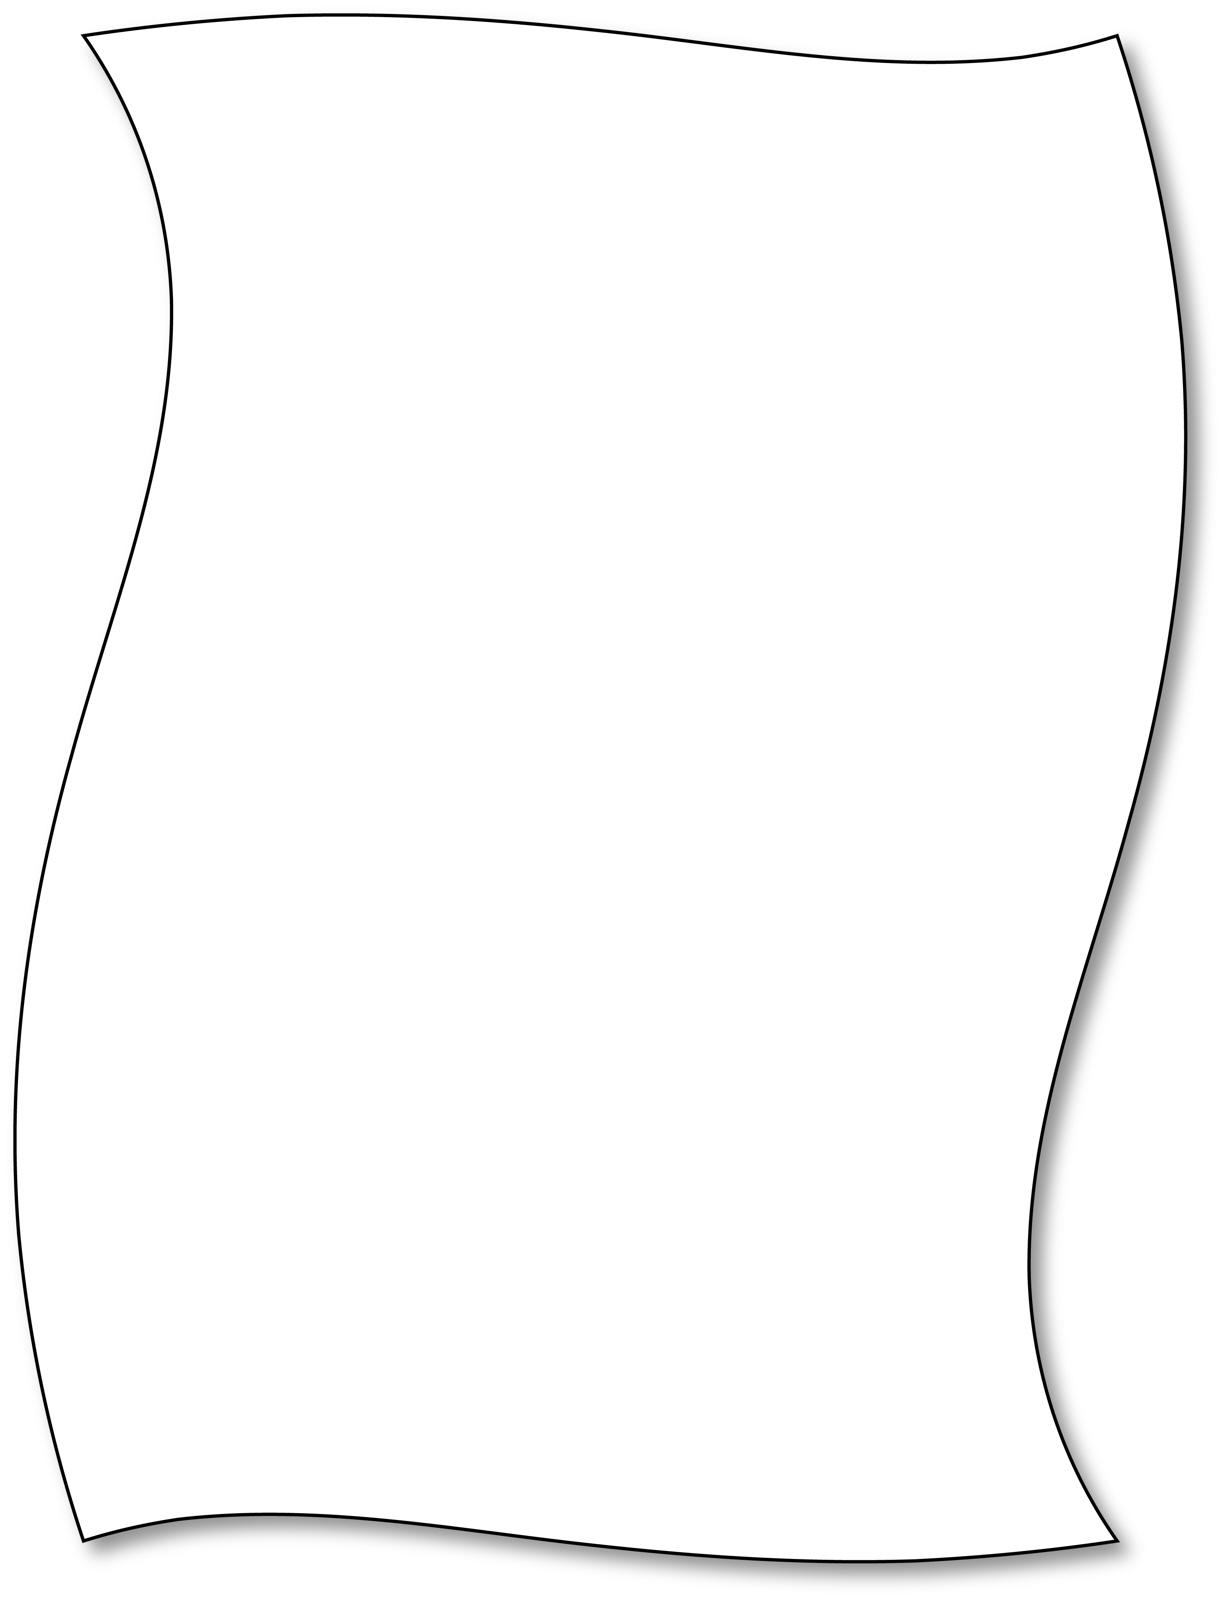 White paper clipart graphic black and white download Free photo: White Paper Border - Graphic, Page, Paper - Free ... graphic black and white download